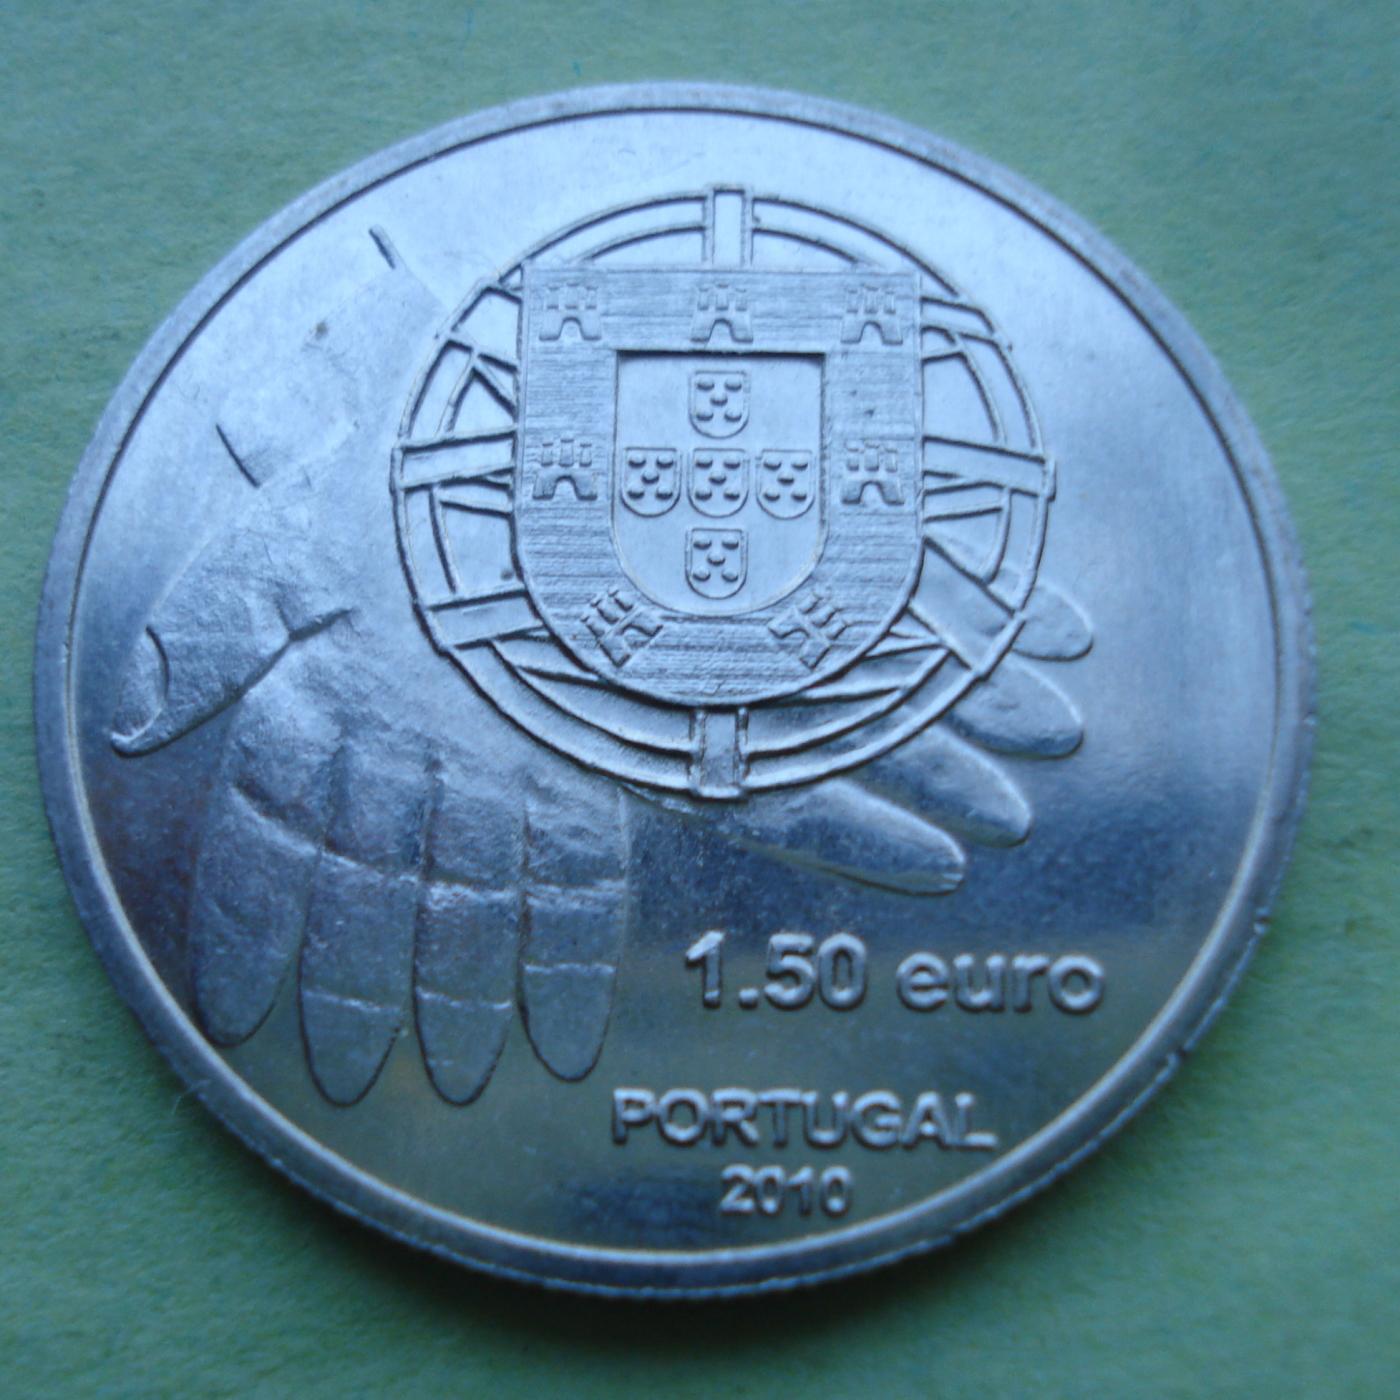 1.50 Euro 2010, EURO (2002-present) - Portugal - Coin - 40900